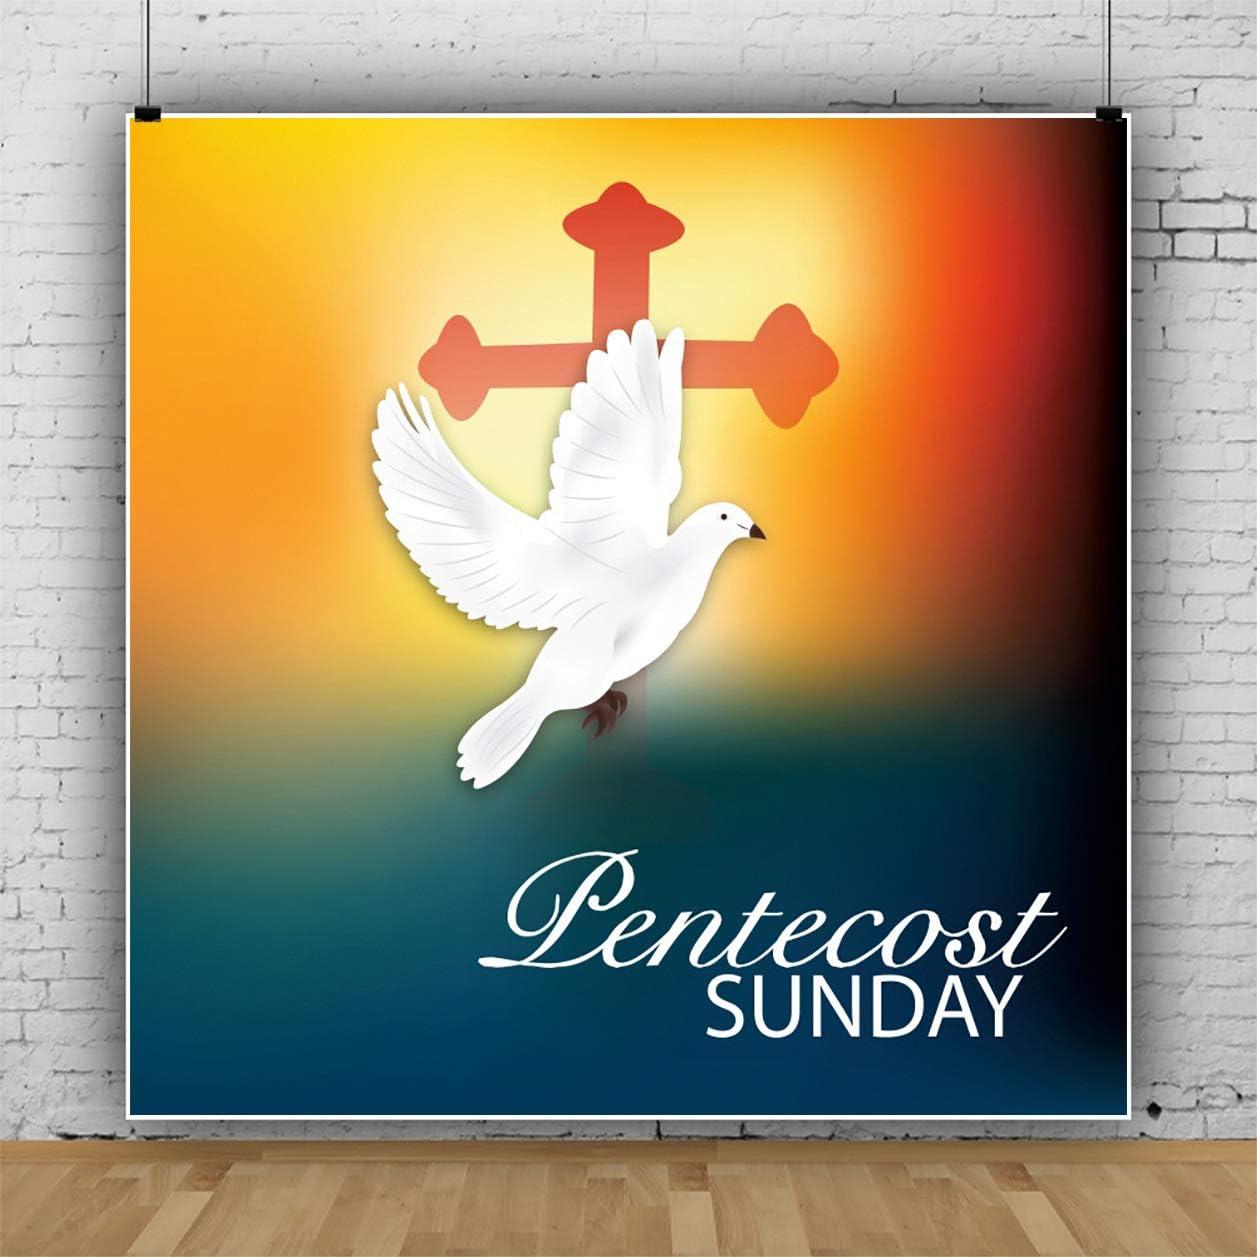 Baocicco 10x10ft Pentecost Sunday Backdrop Holy Spirit of Lord Crucifix Cross Holy Flame Photography Background Wallpaper Decoration Baptism Christening Chrismation Holy Communion Photoshoot Props